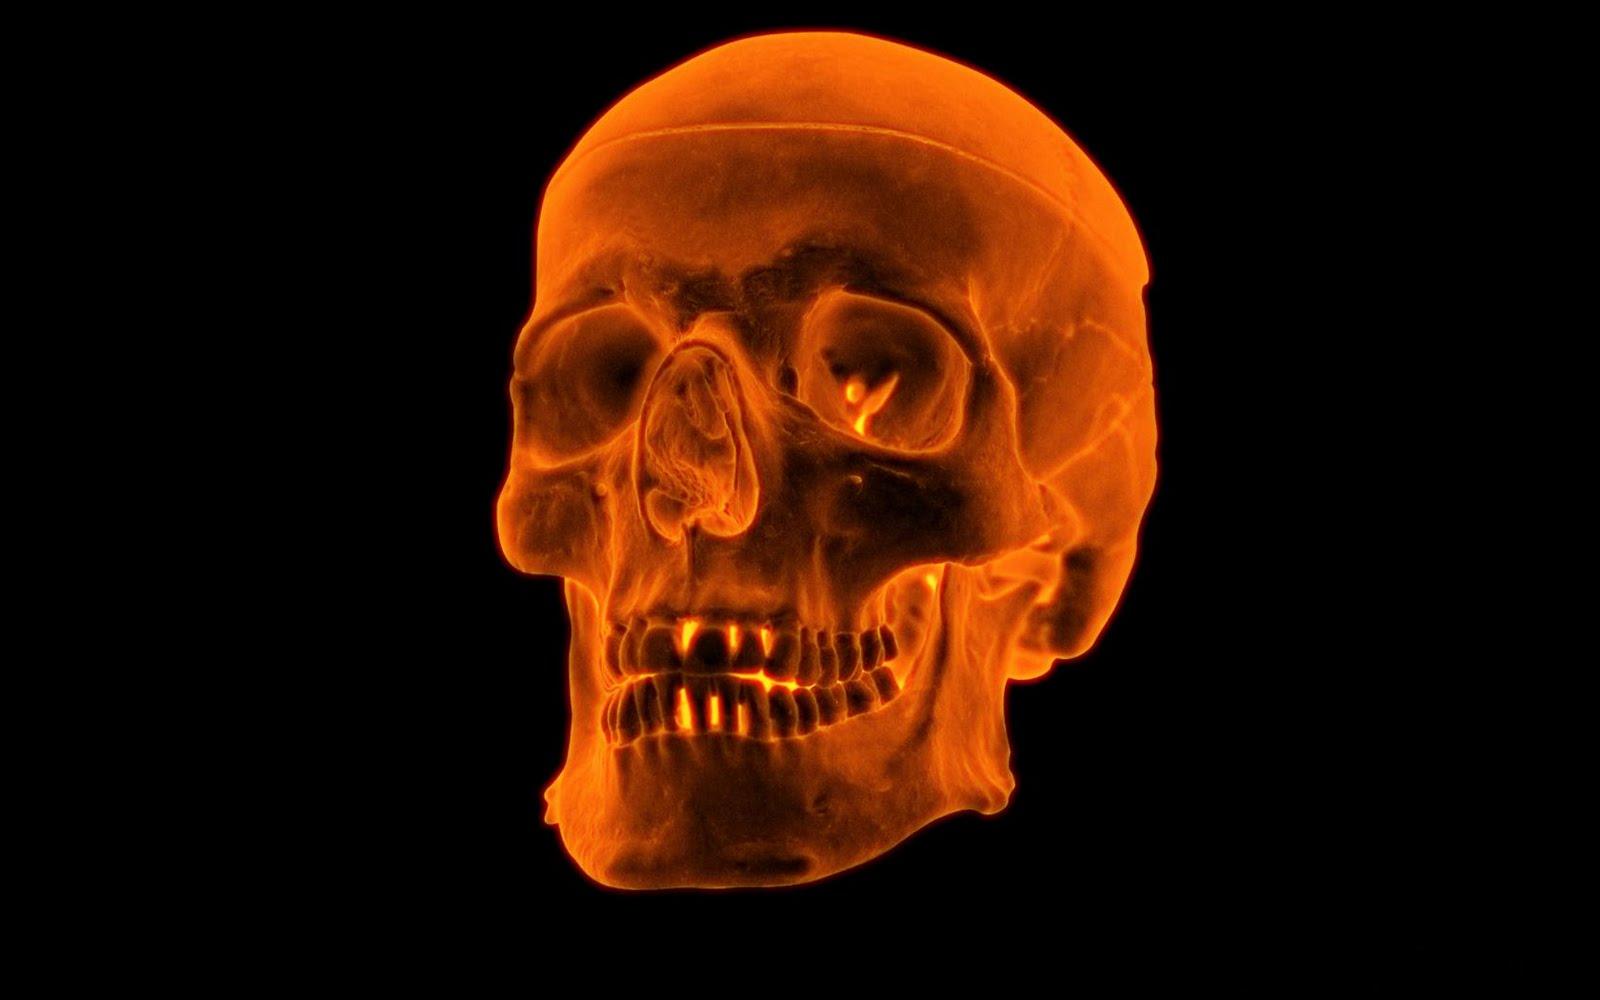 3D Fire Skull wallpapers 1600x1000